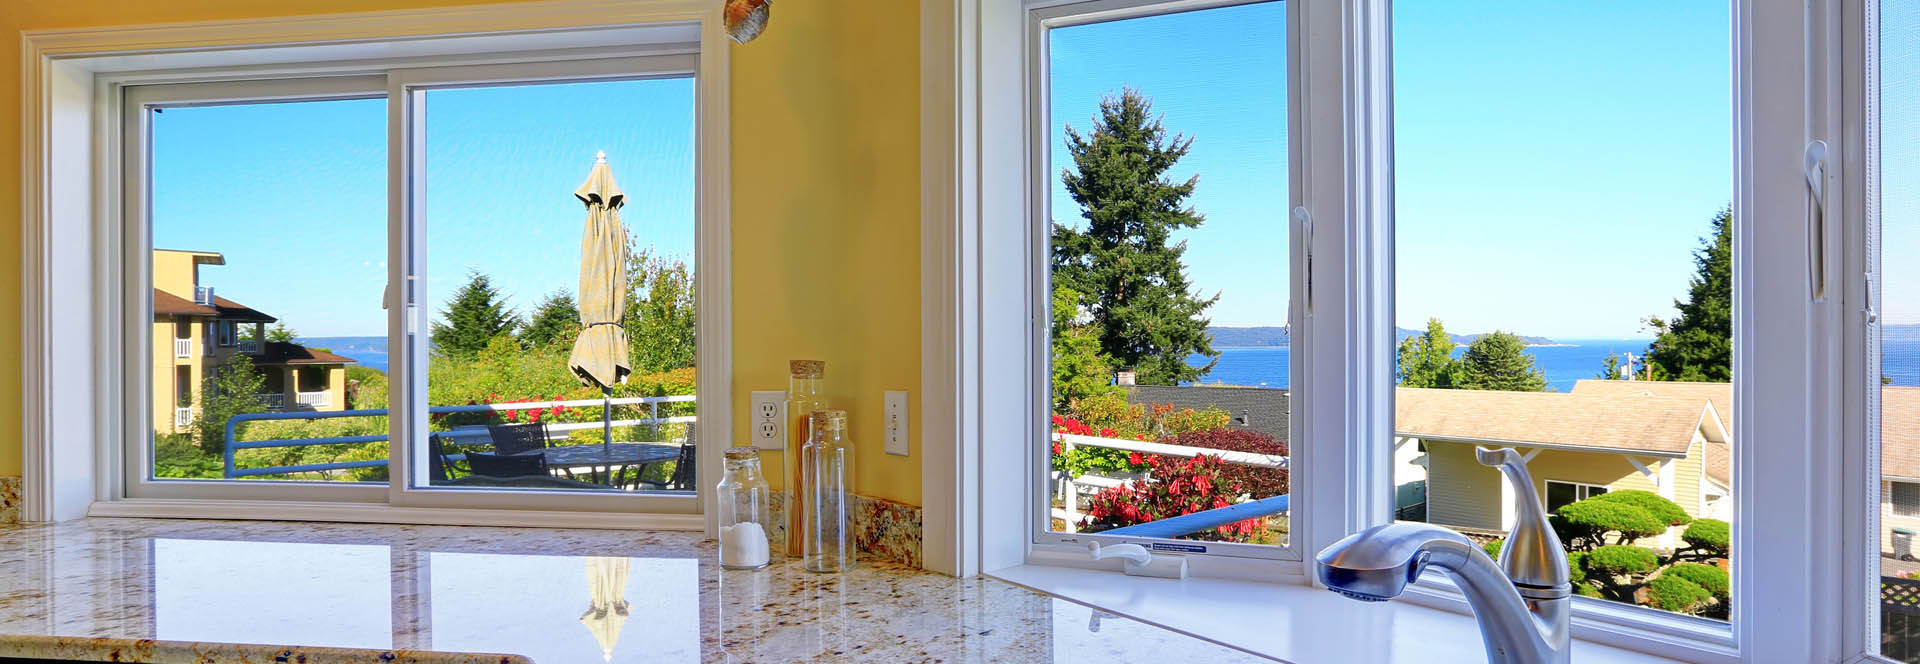 kitchen with window view